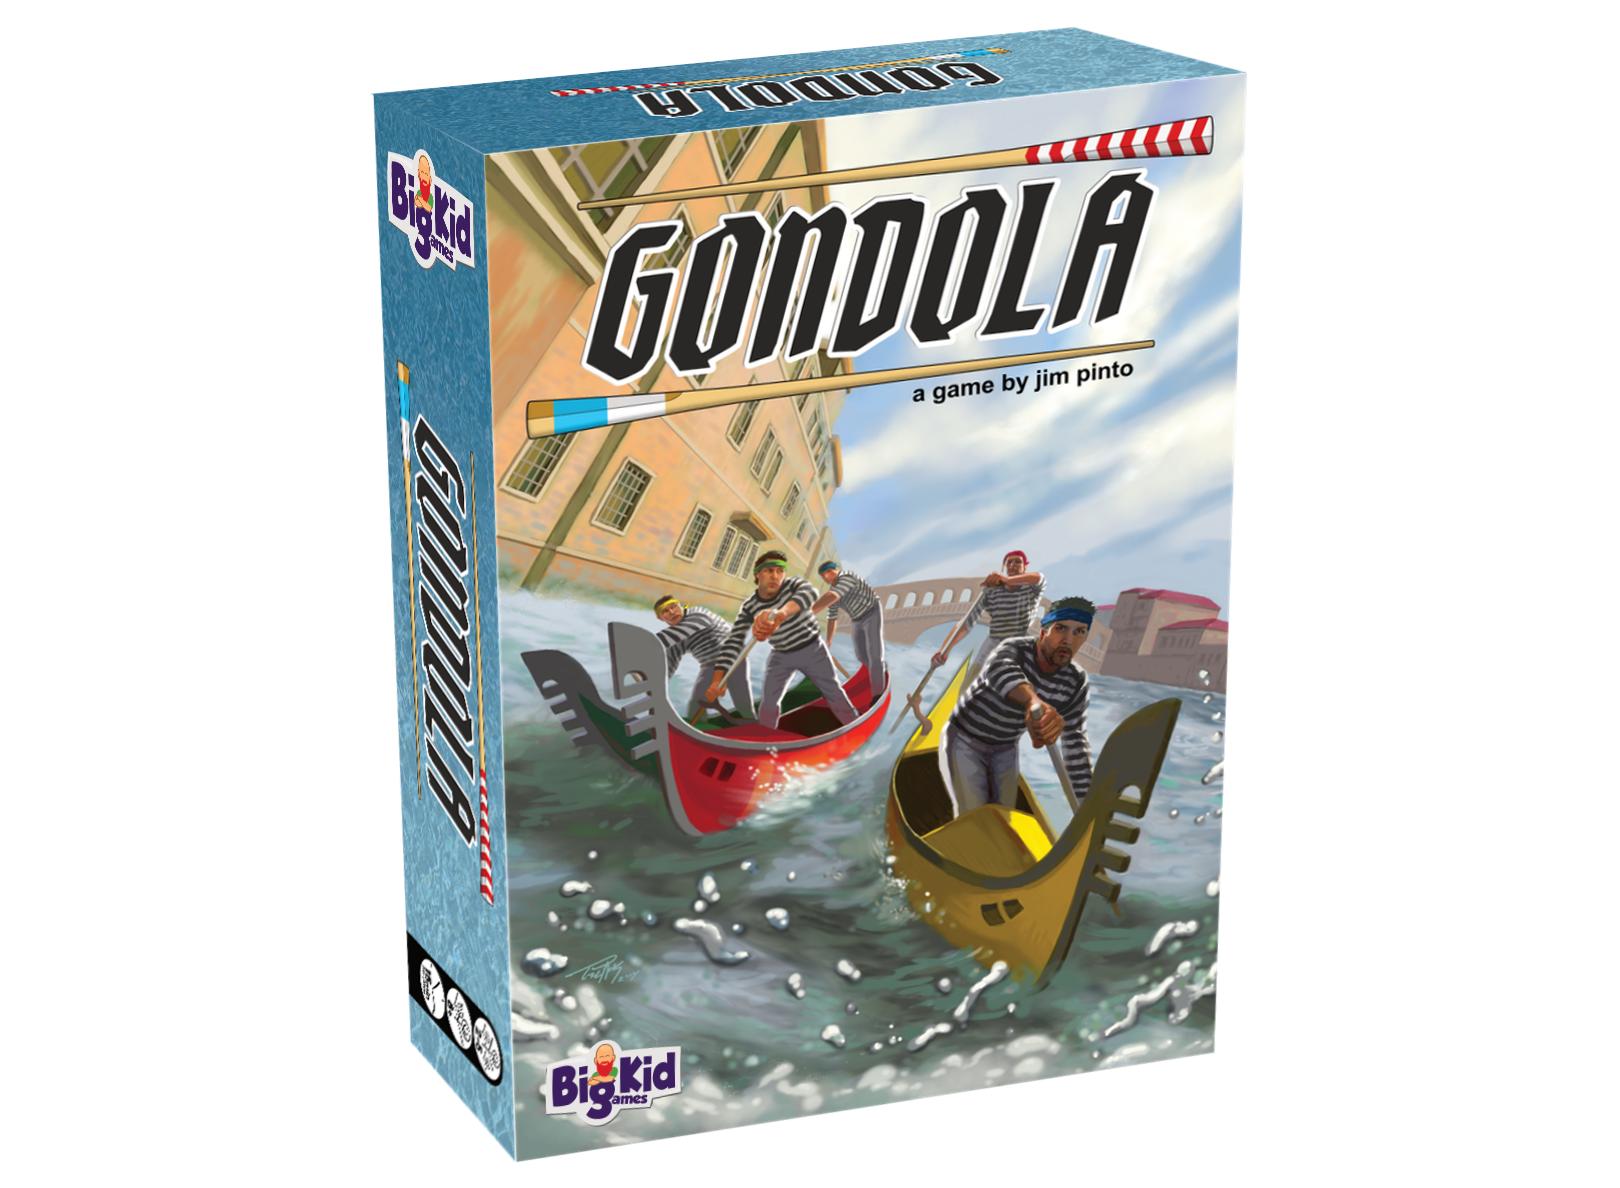 3d gondola box_site.png